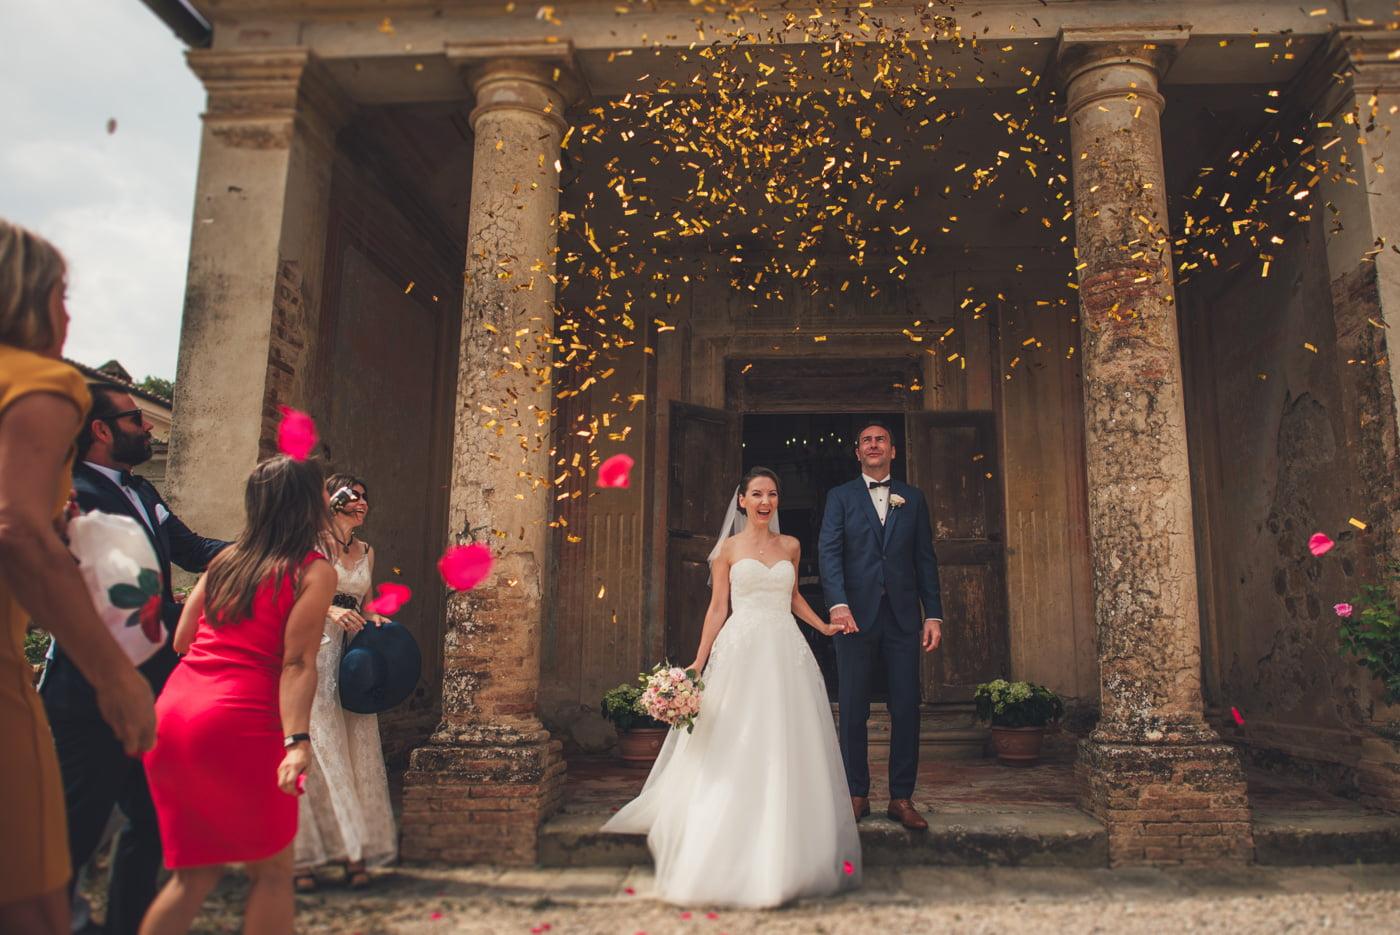 020-wedding-tuscany-rignana-jpg-1